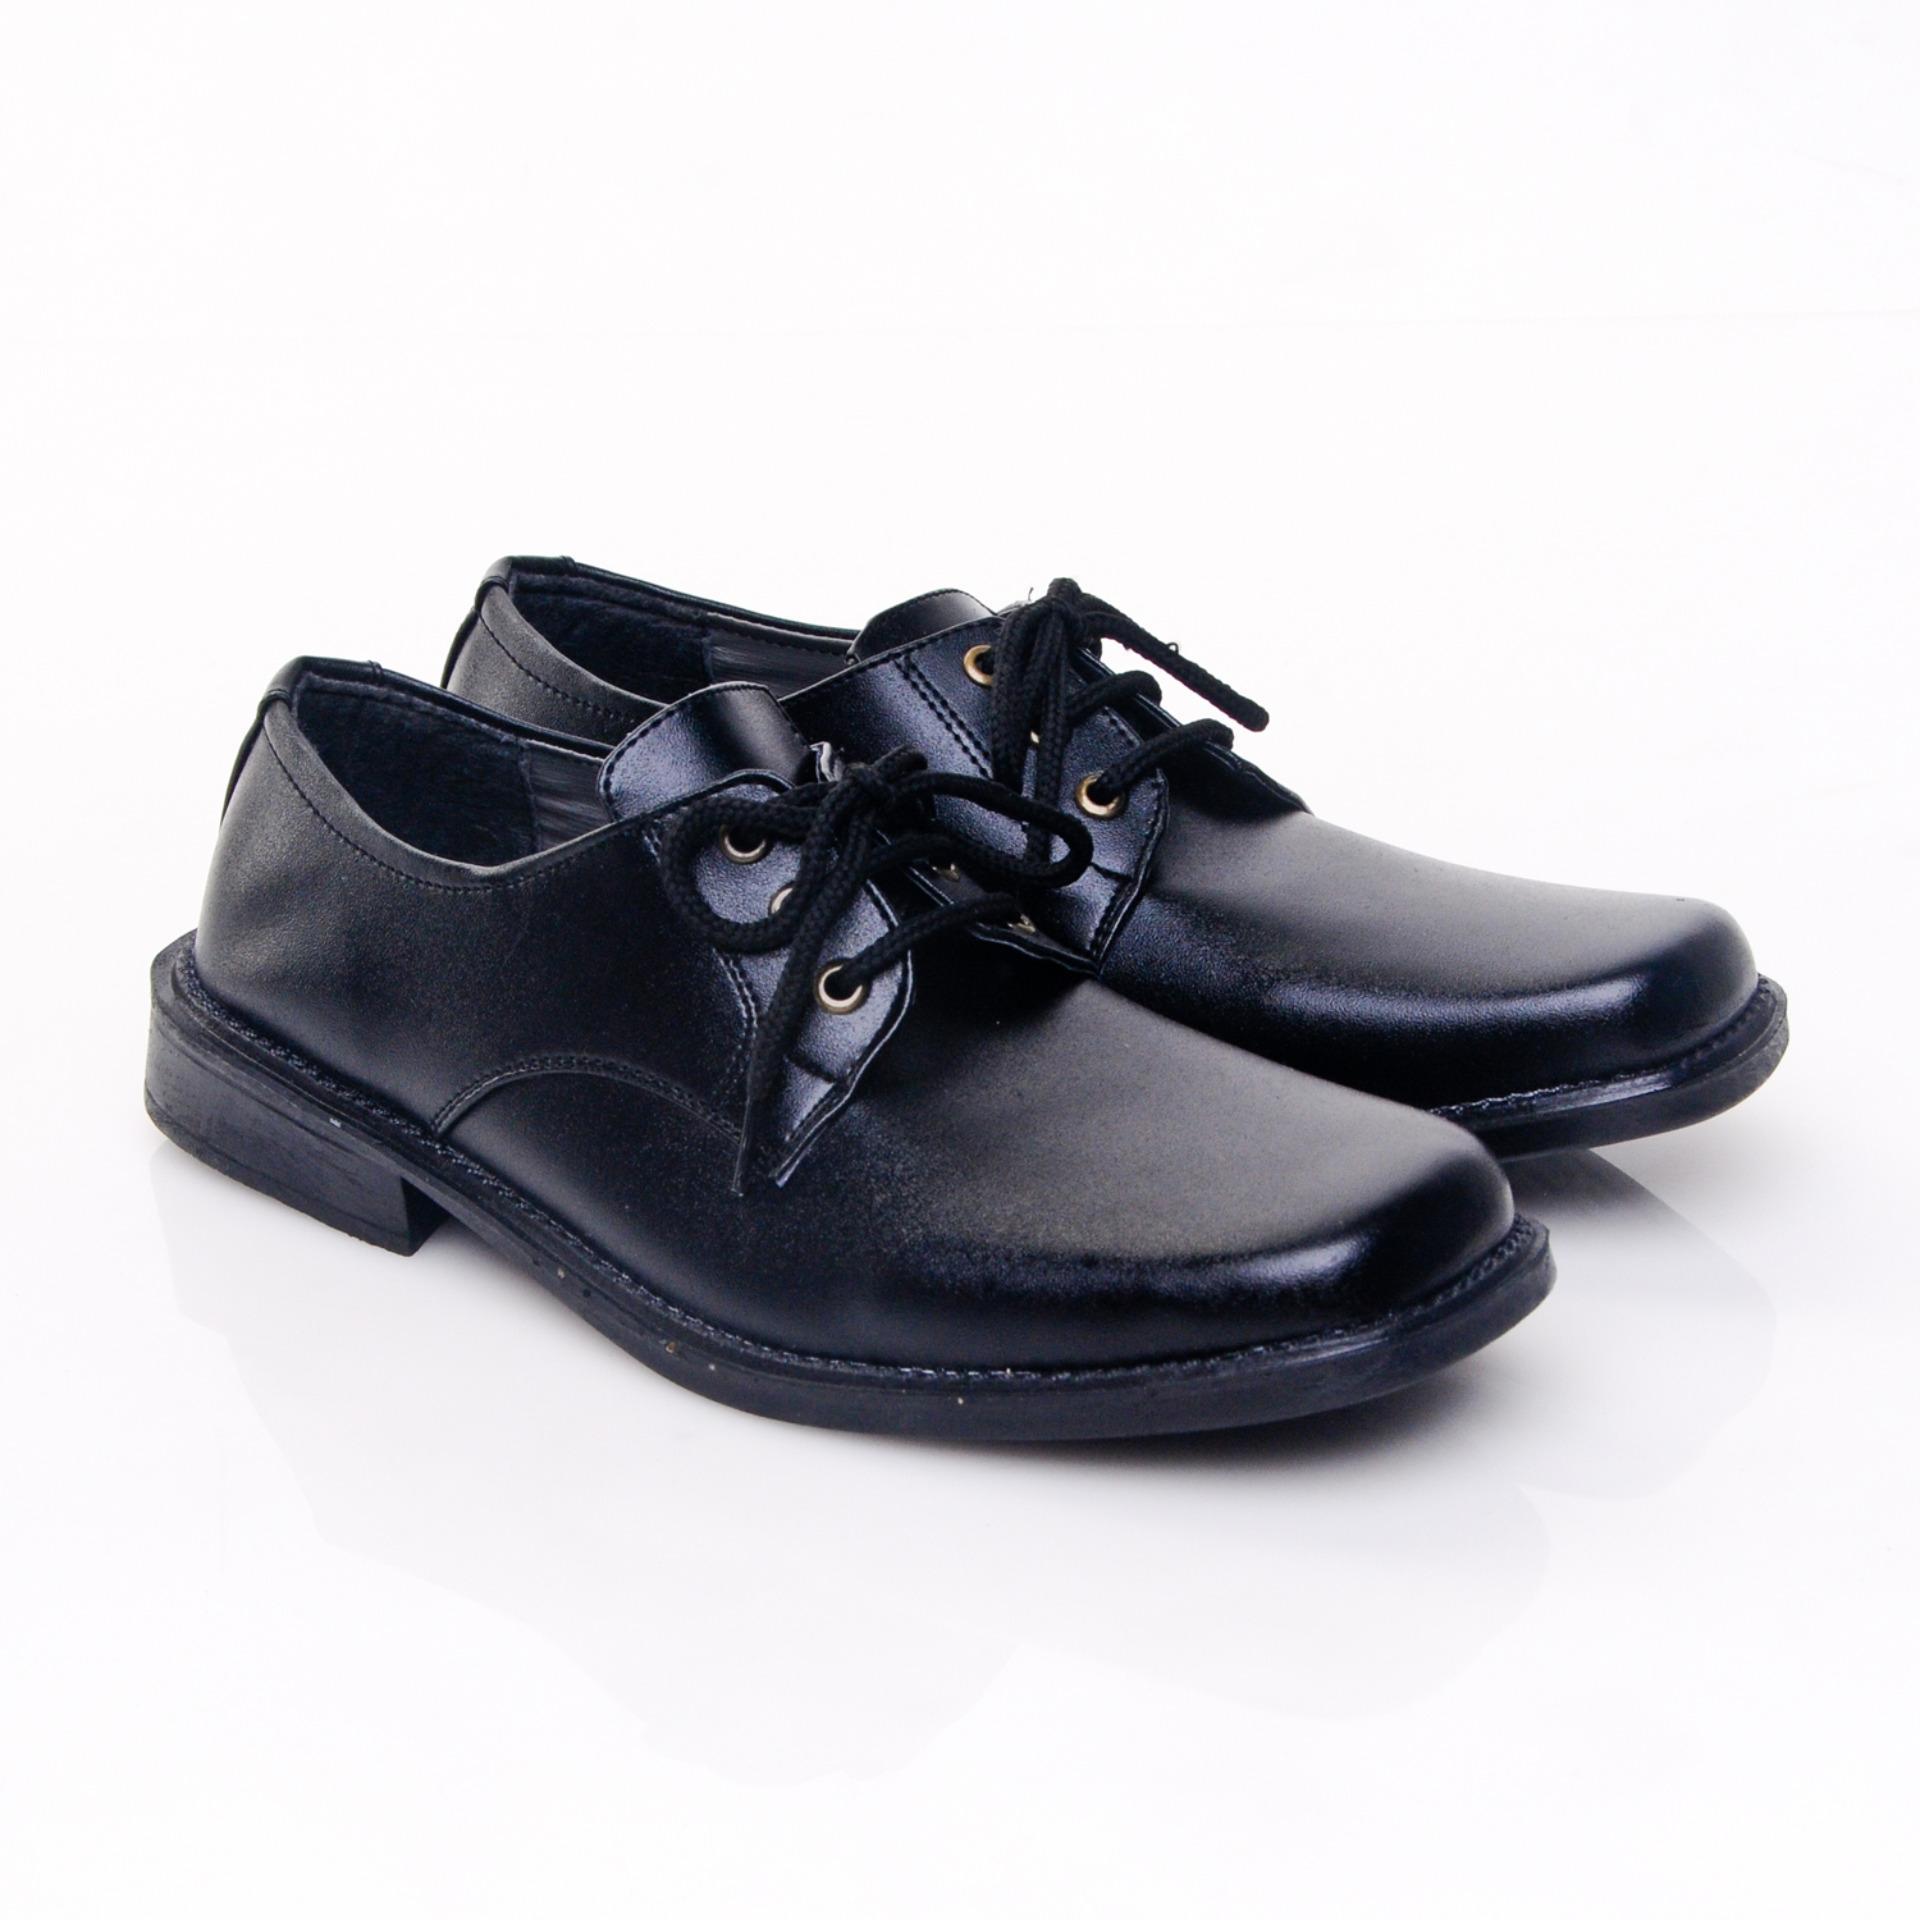 Beli Salvo Sepatu Pantofel Kf404 Hitam Salvo Murah